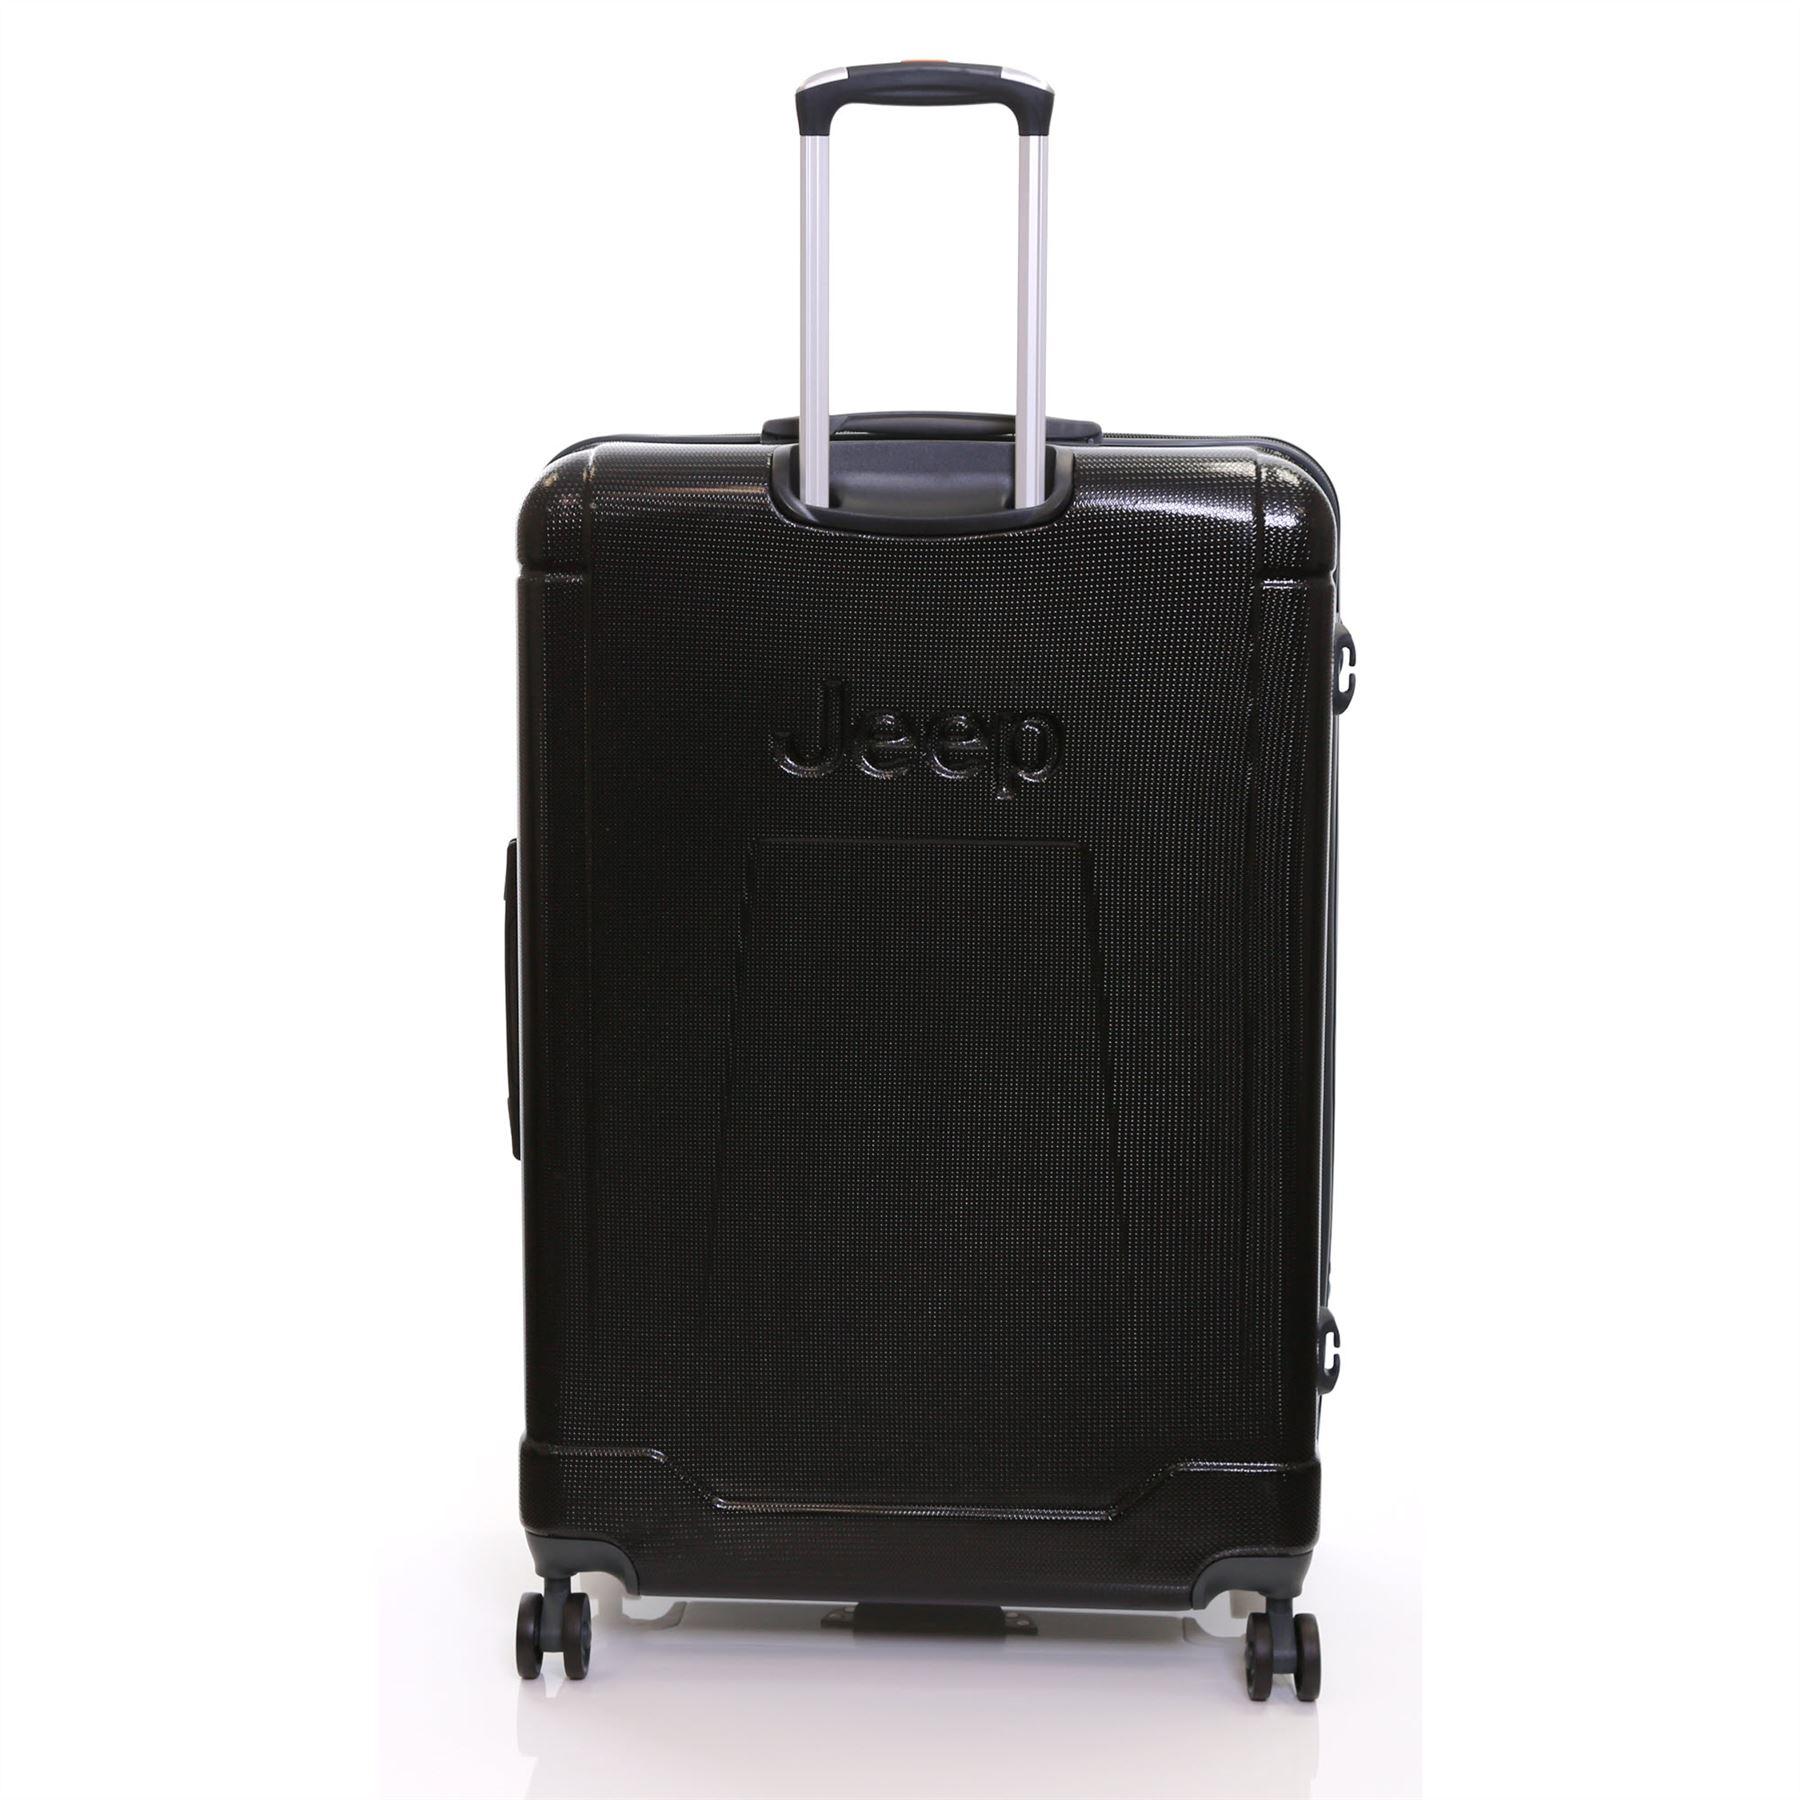 jeep xl 80 cm hartplastik gro er trolley koffer reisegep ck gep ck reisetasche ebay. Black Bedroom Furniture Sets. Home Design Ideas